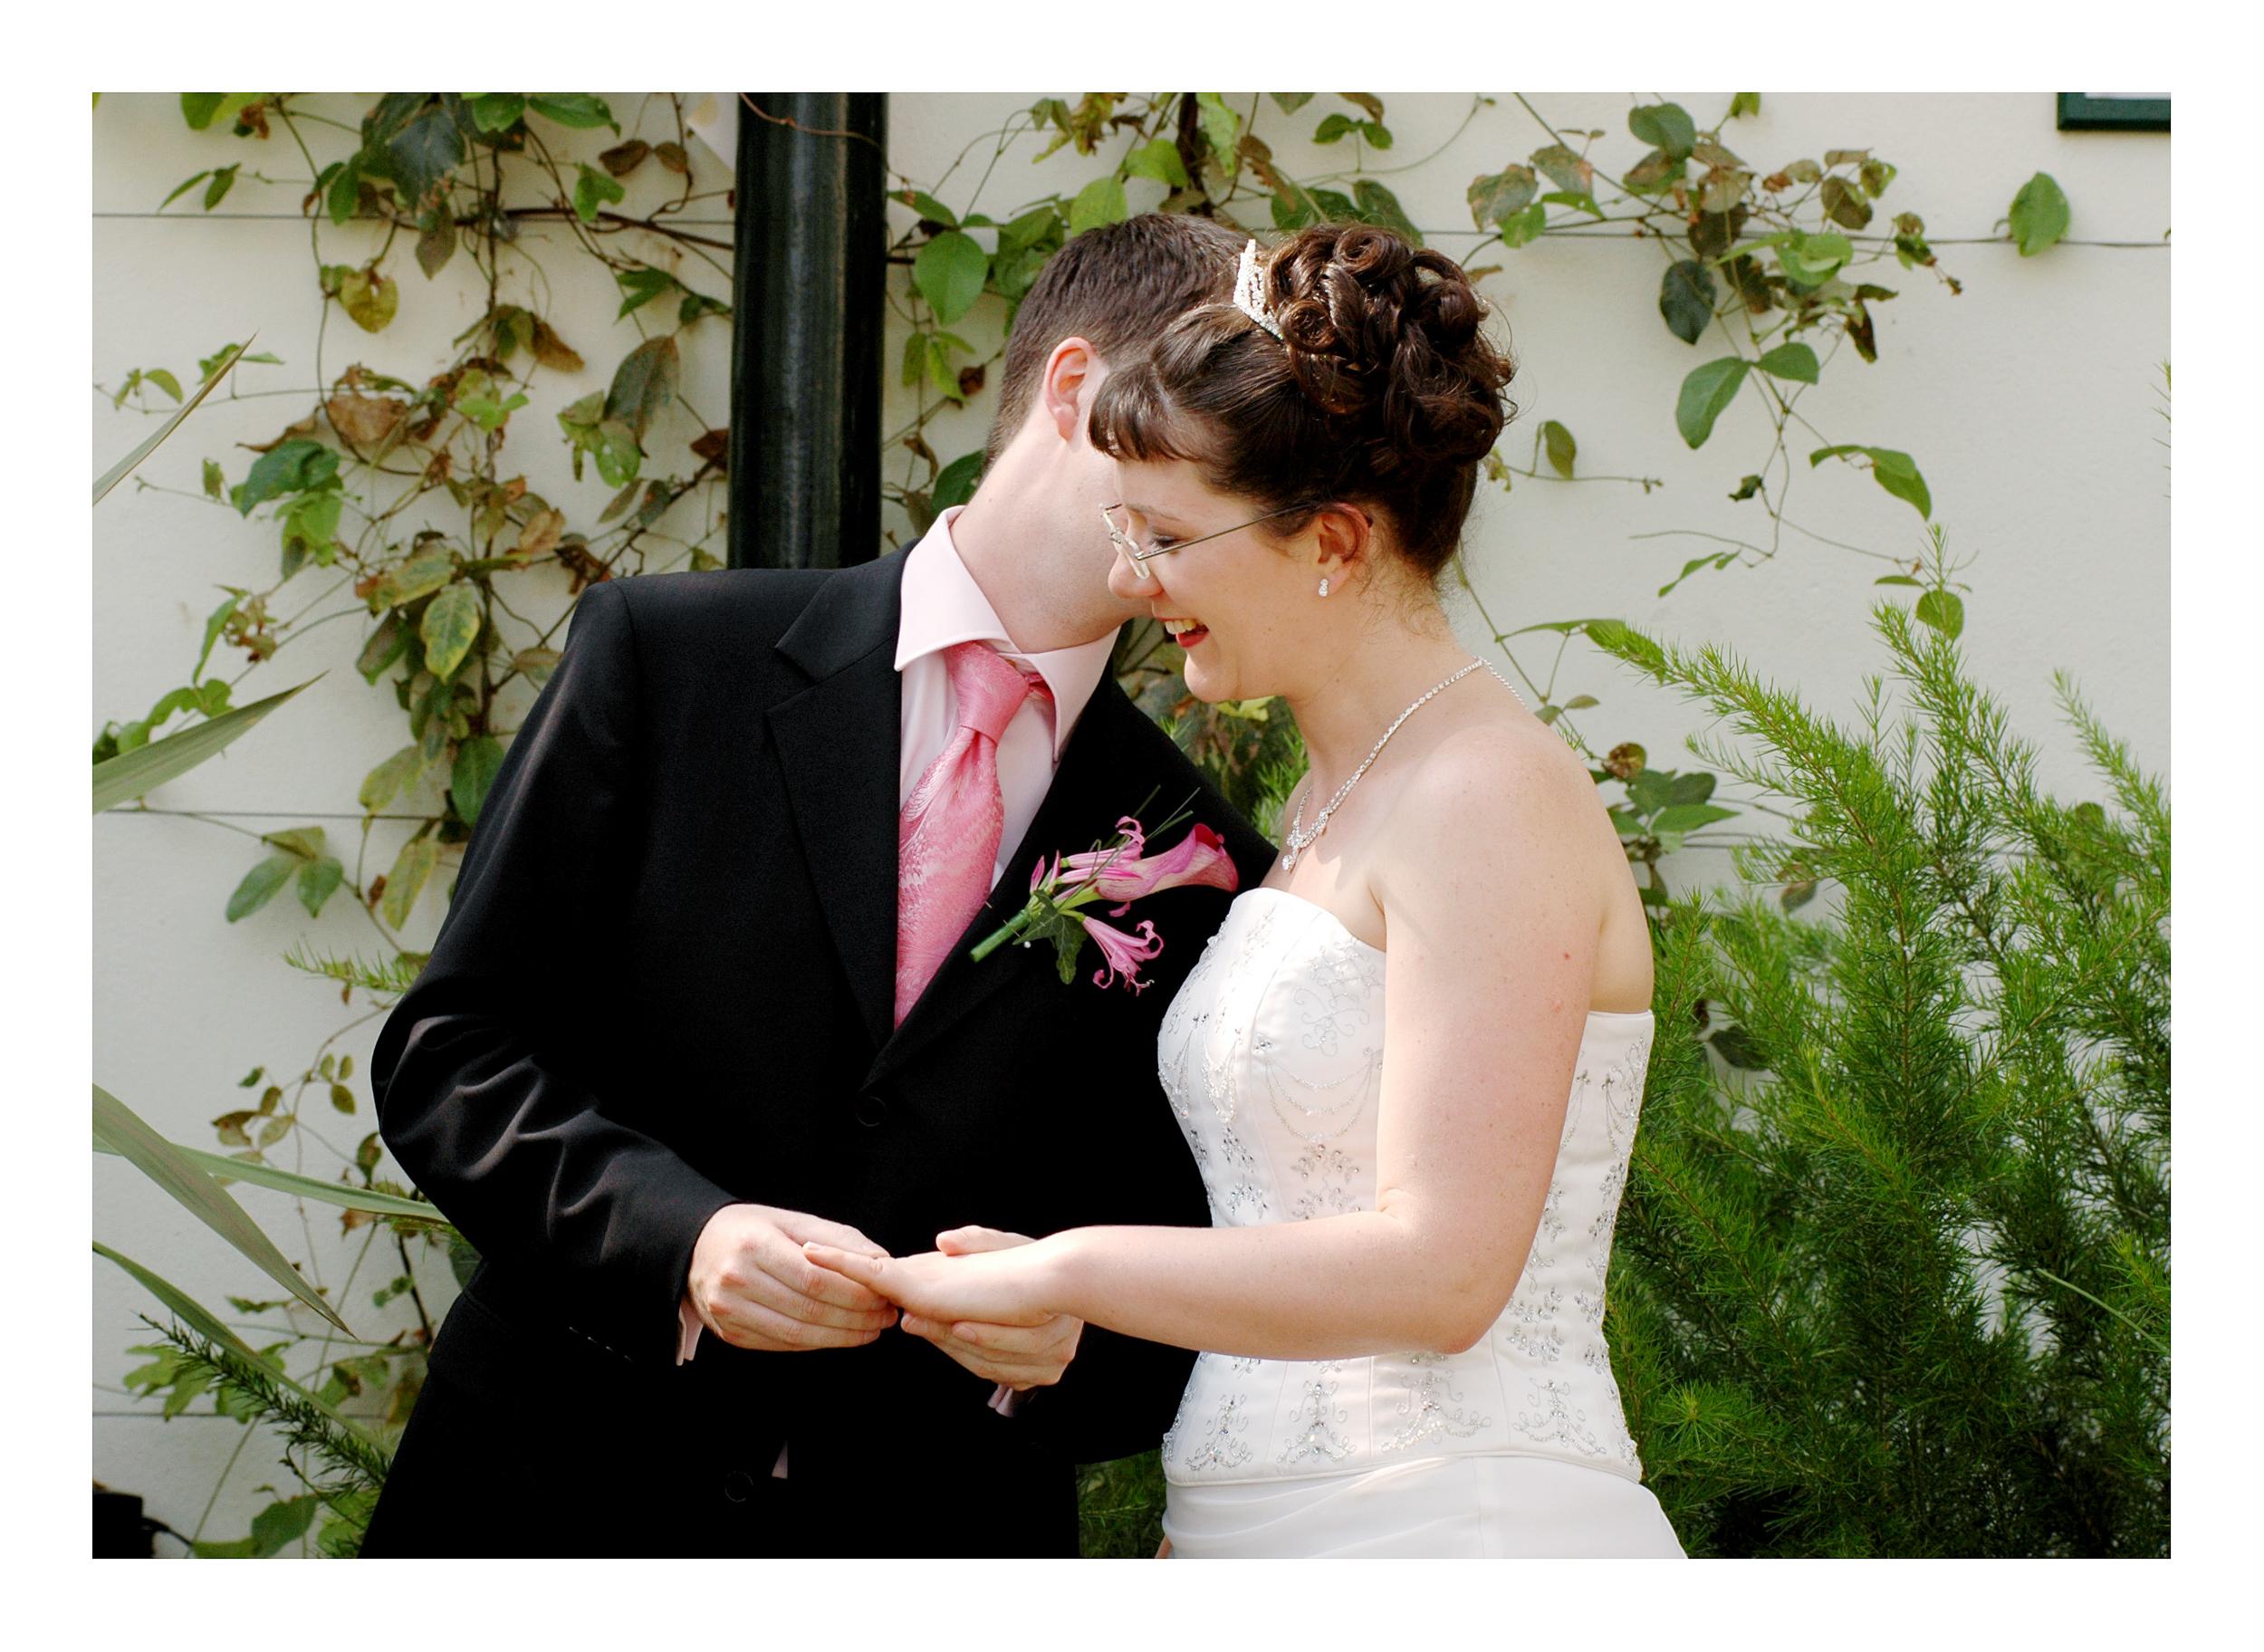 REPORTAGE-WEDDING-PHOTOGRAPHY-SET-UK-14.jpg